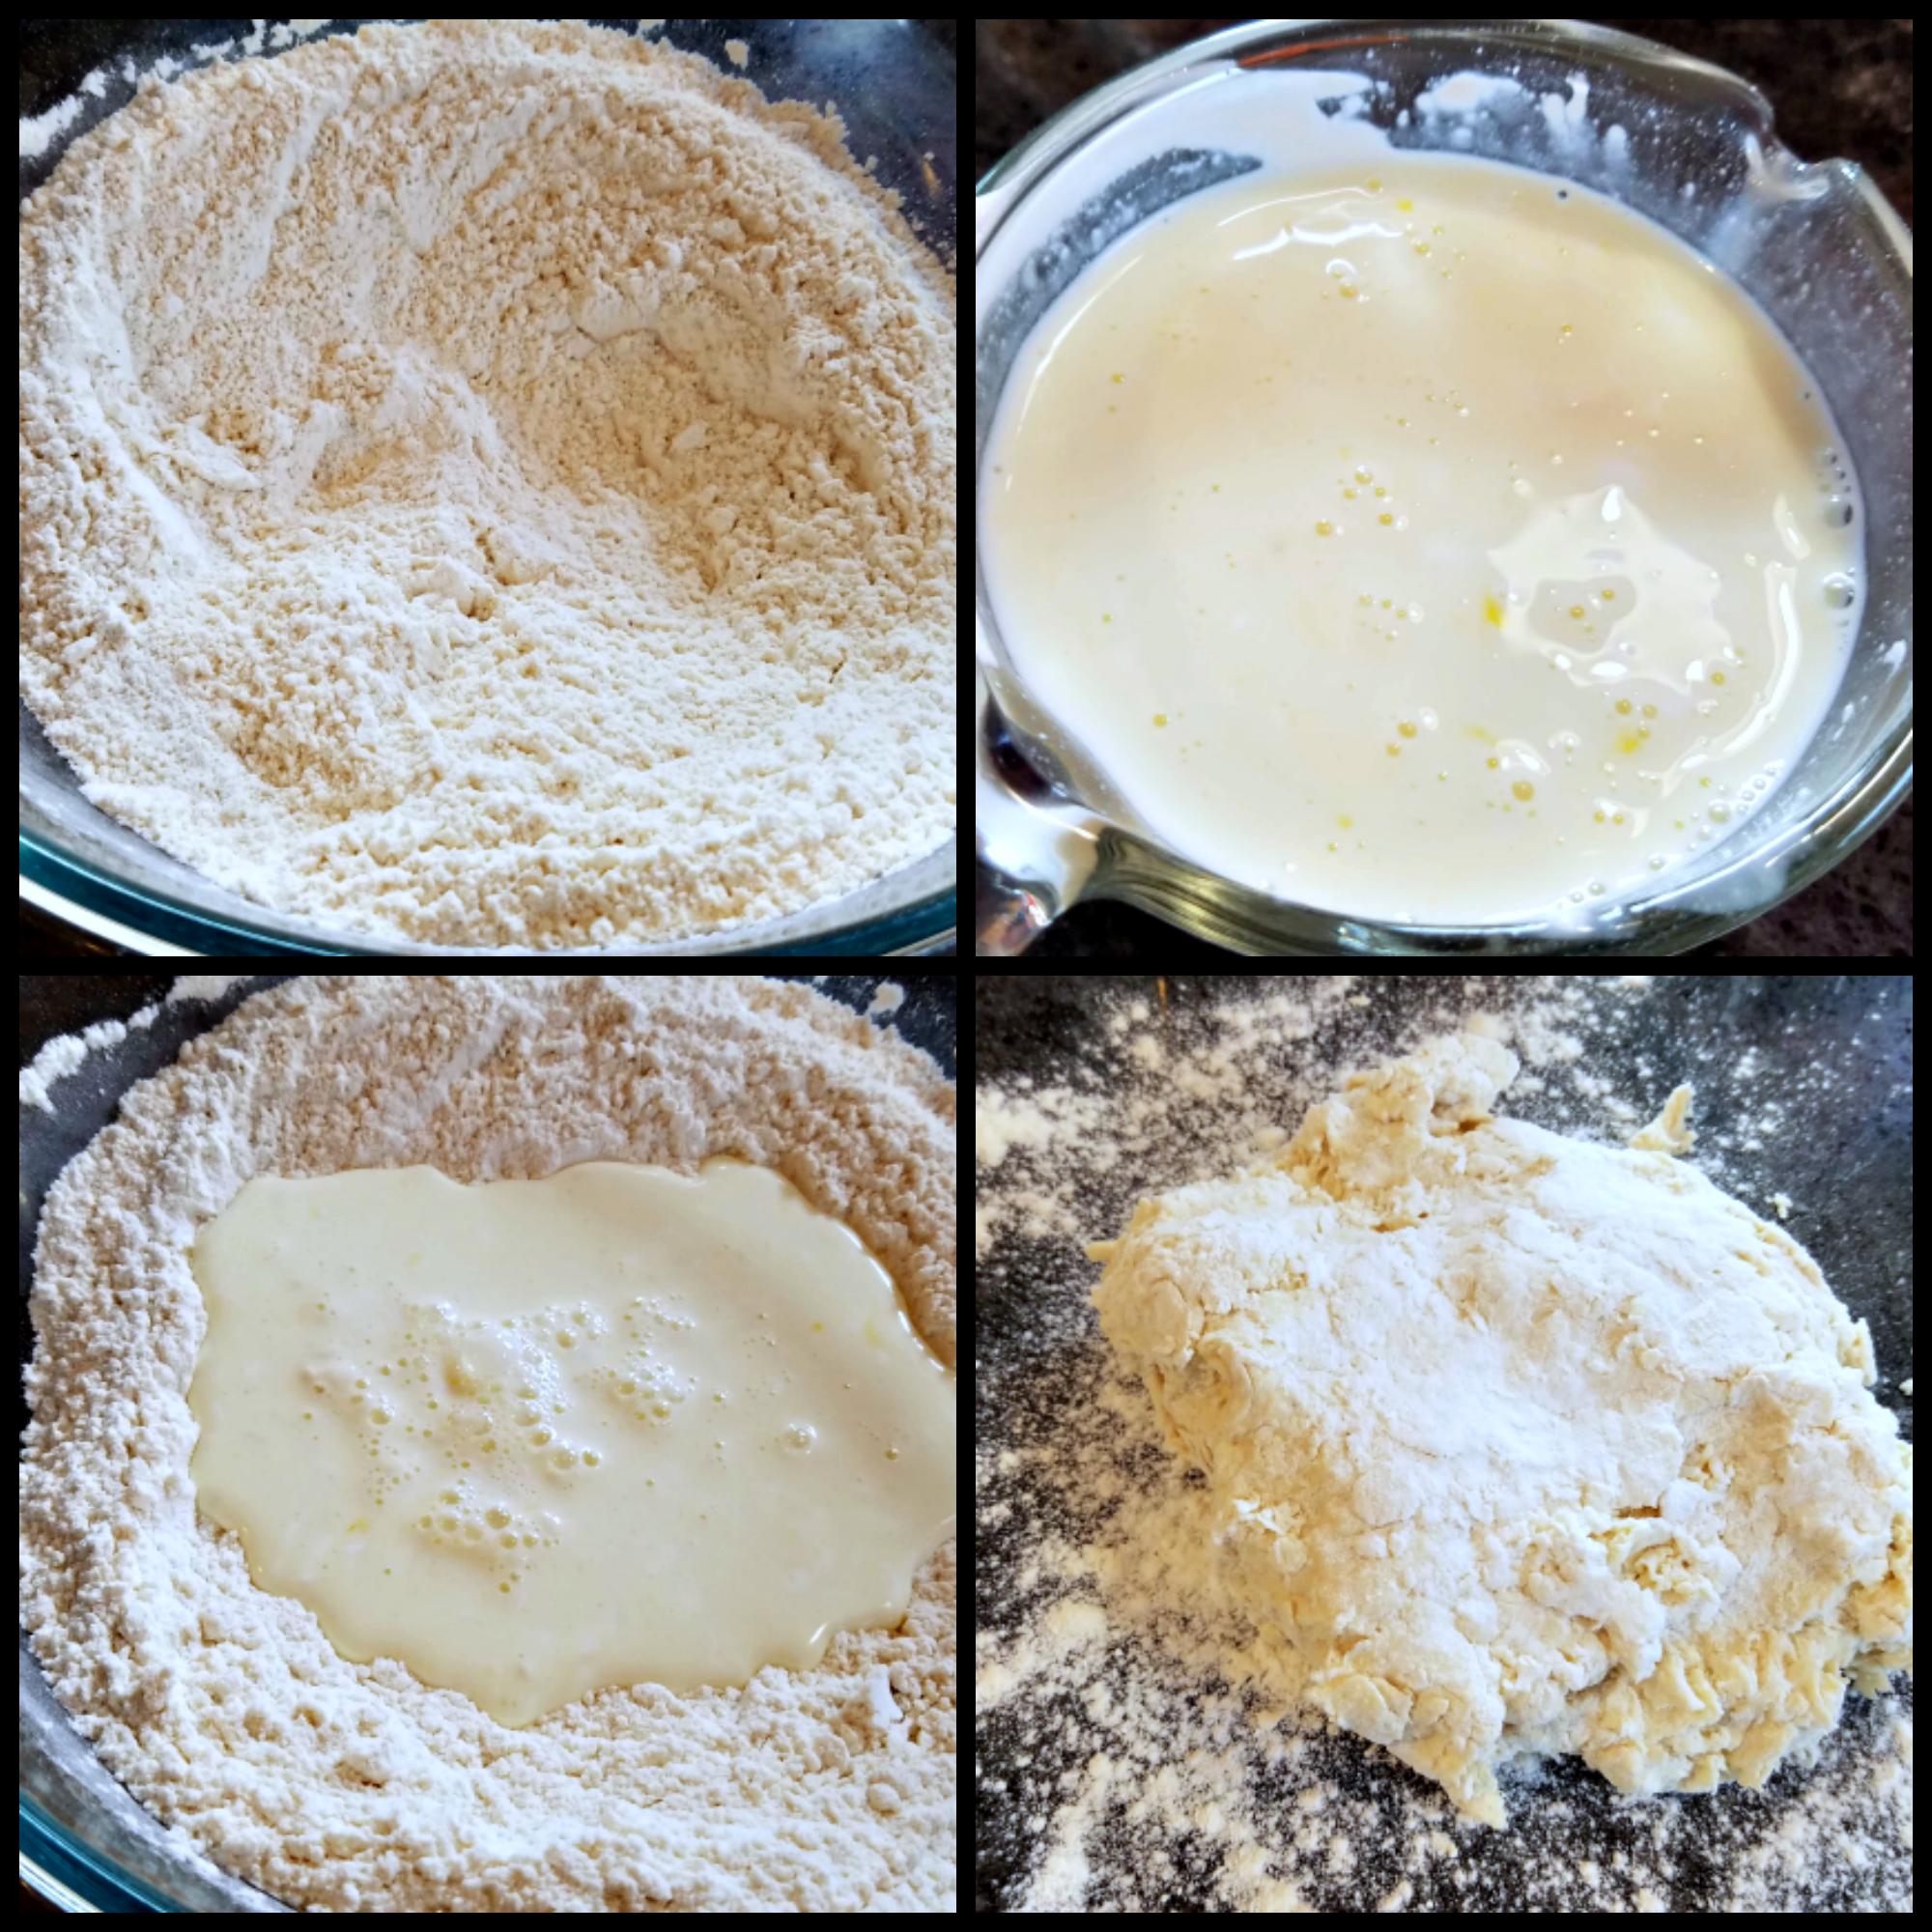 homemade naan recipe, naan, homemade naan, flatbread